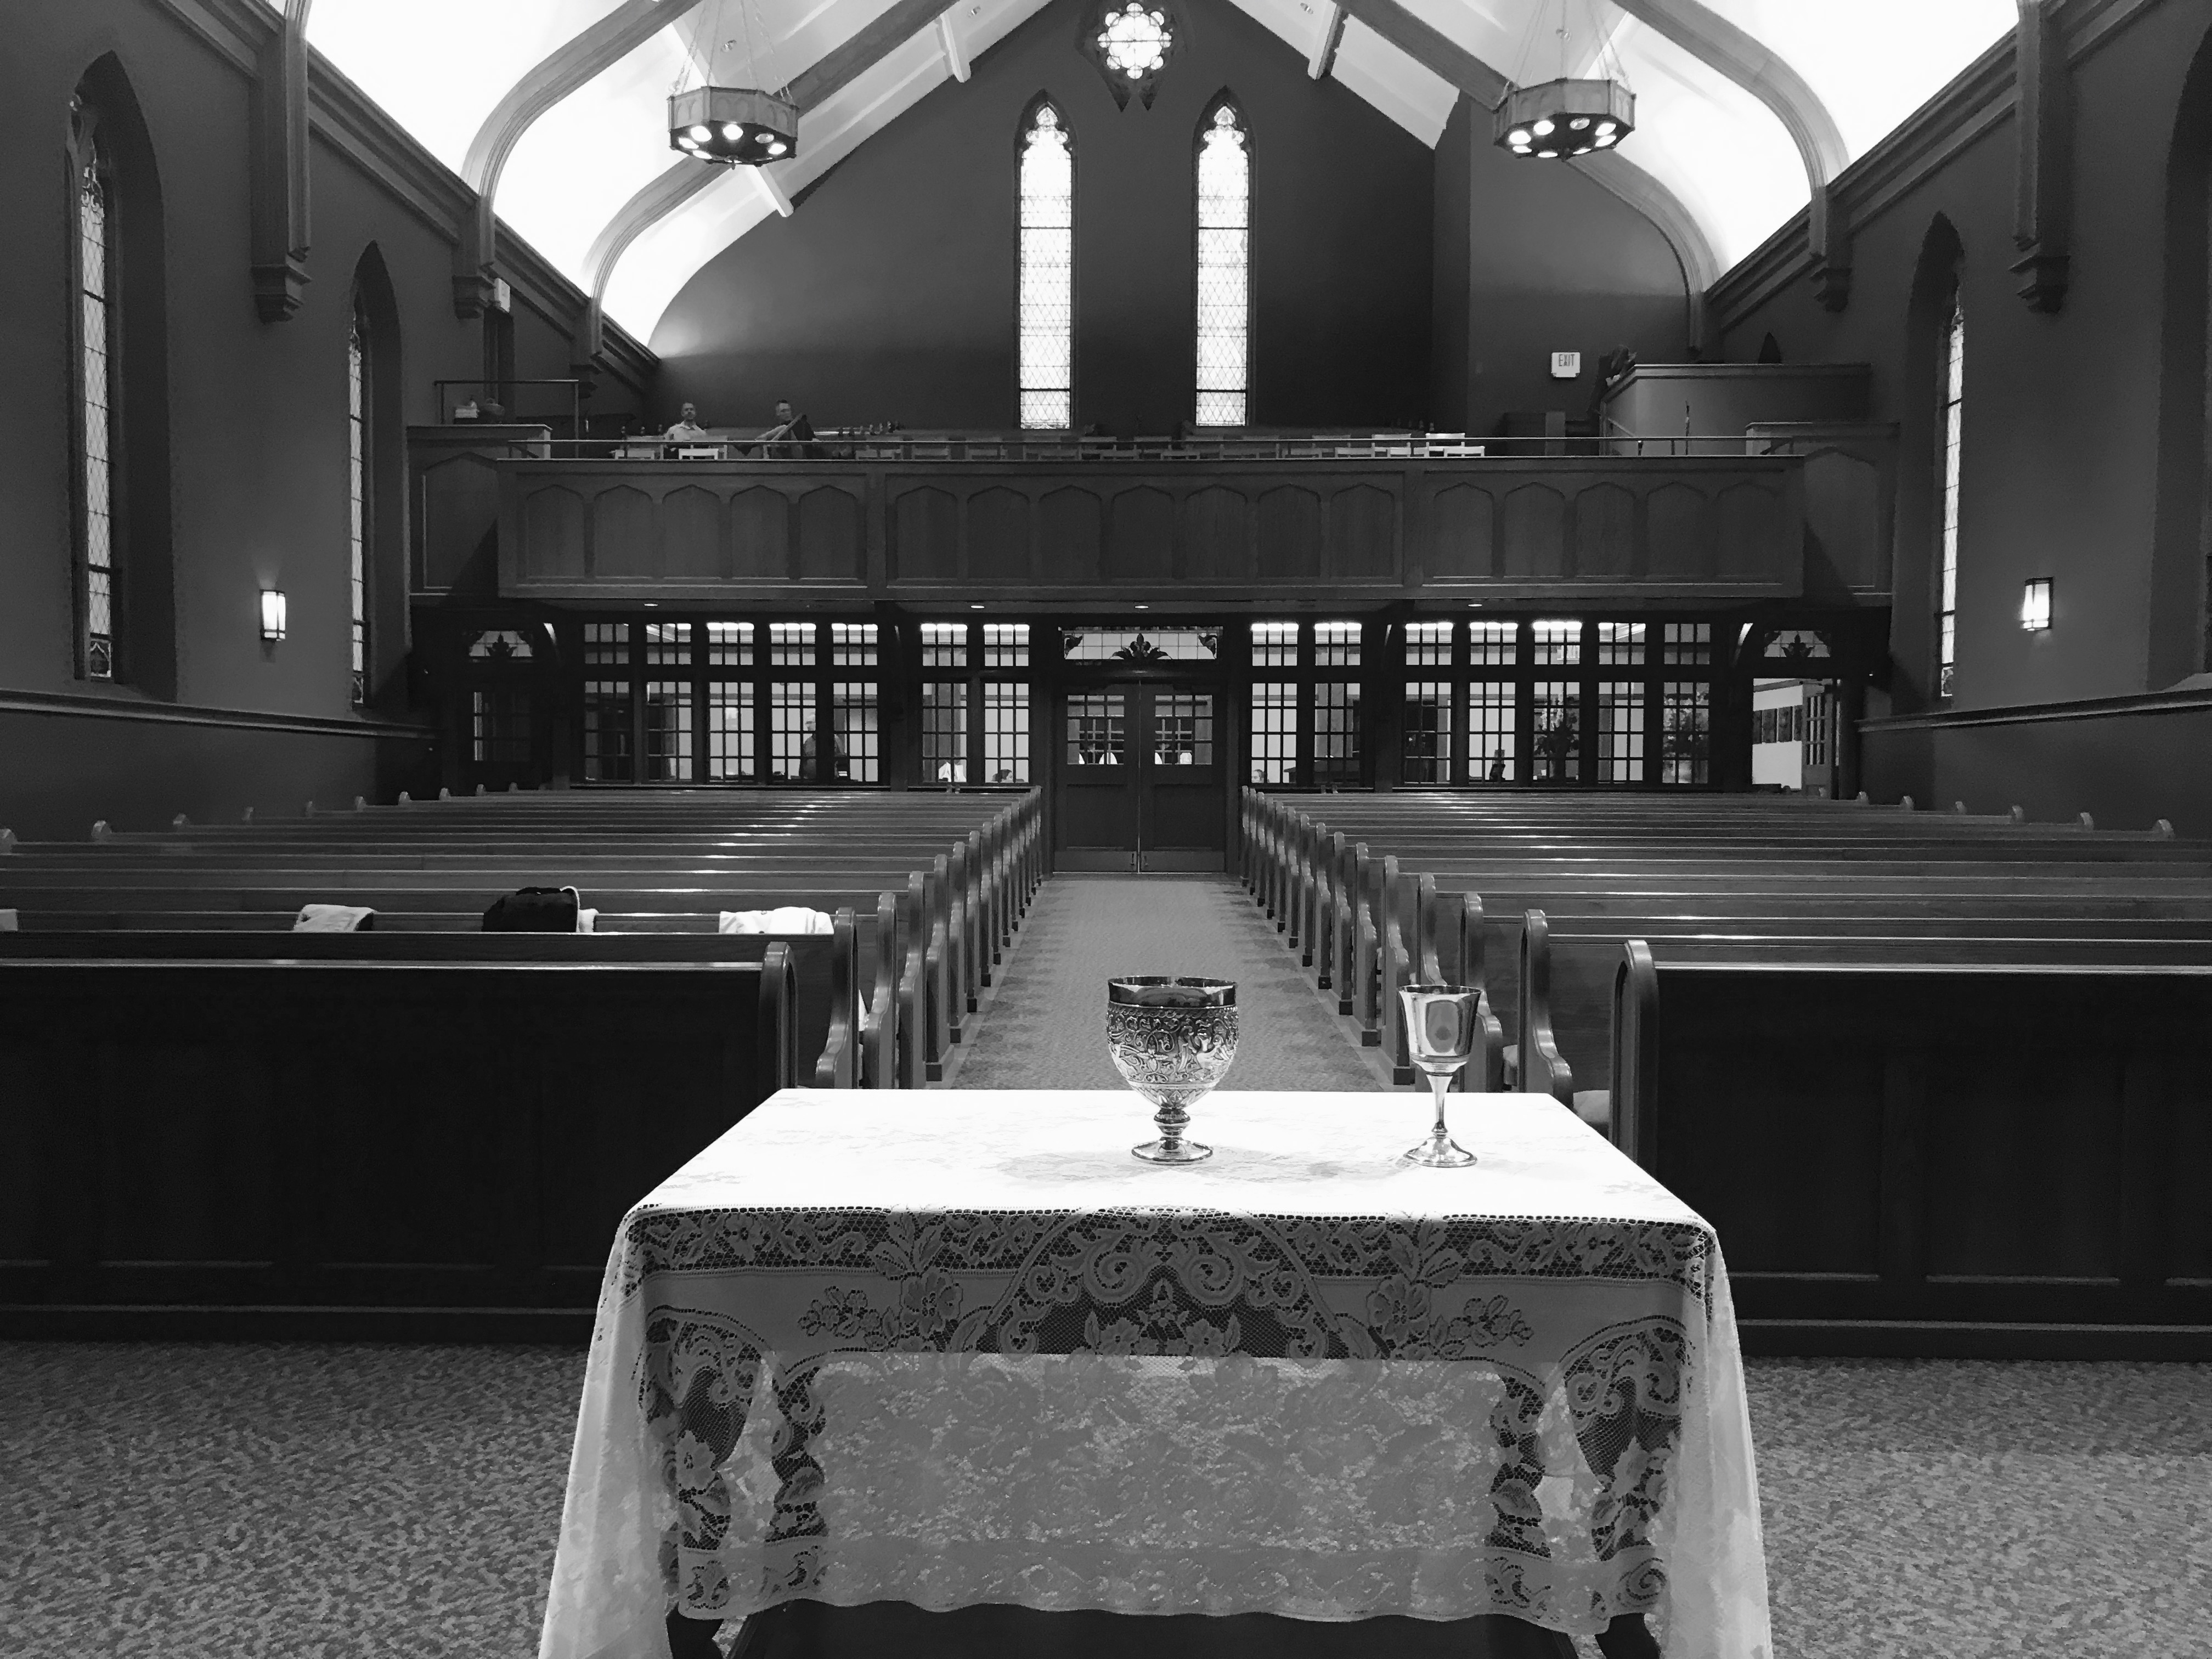 image of sanctuary communion